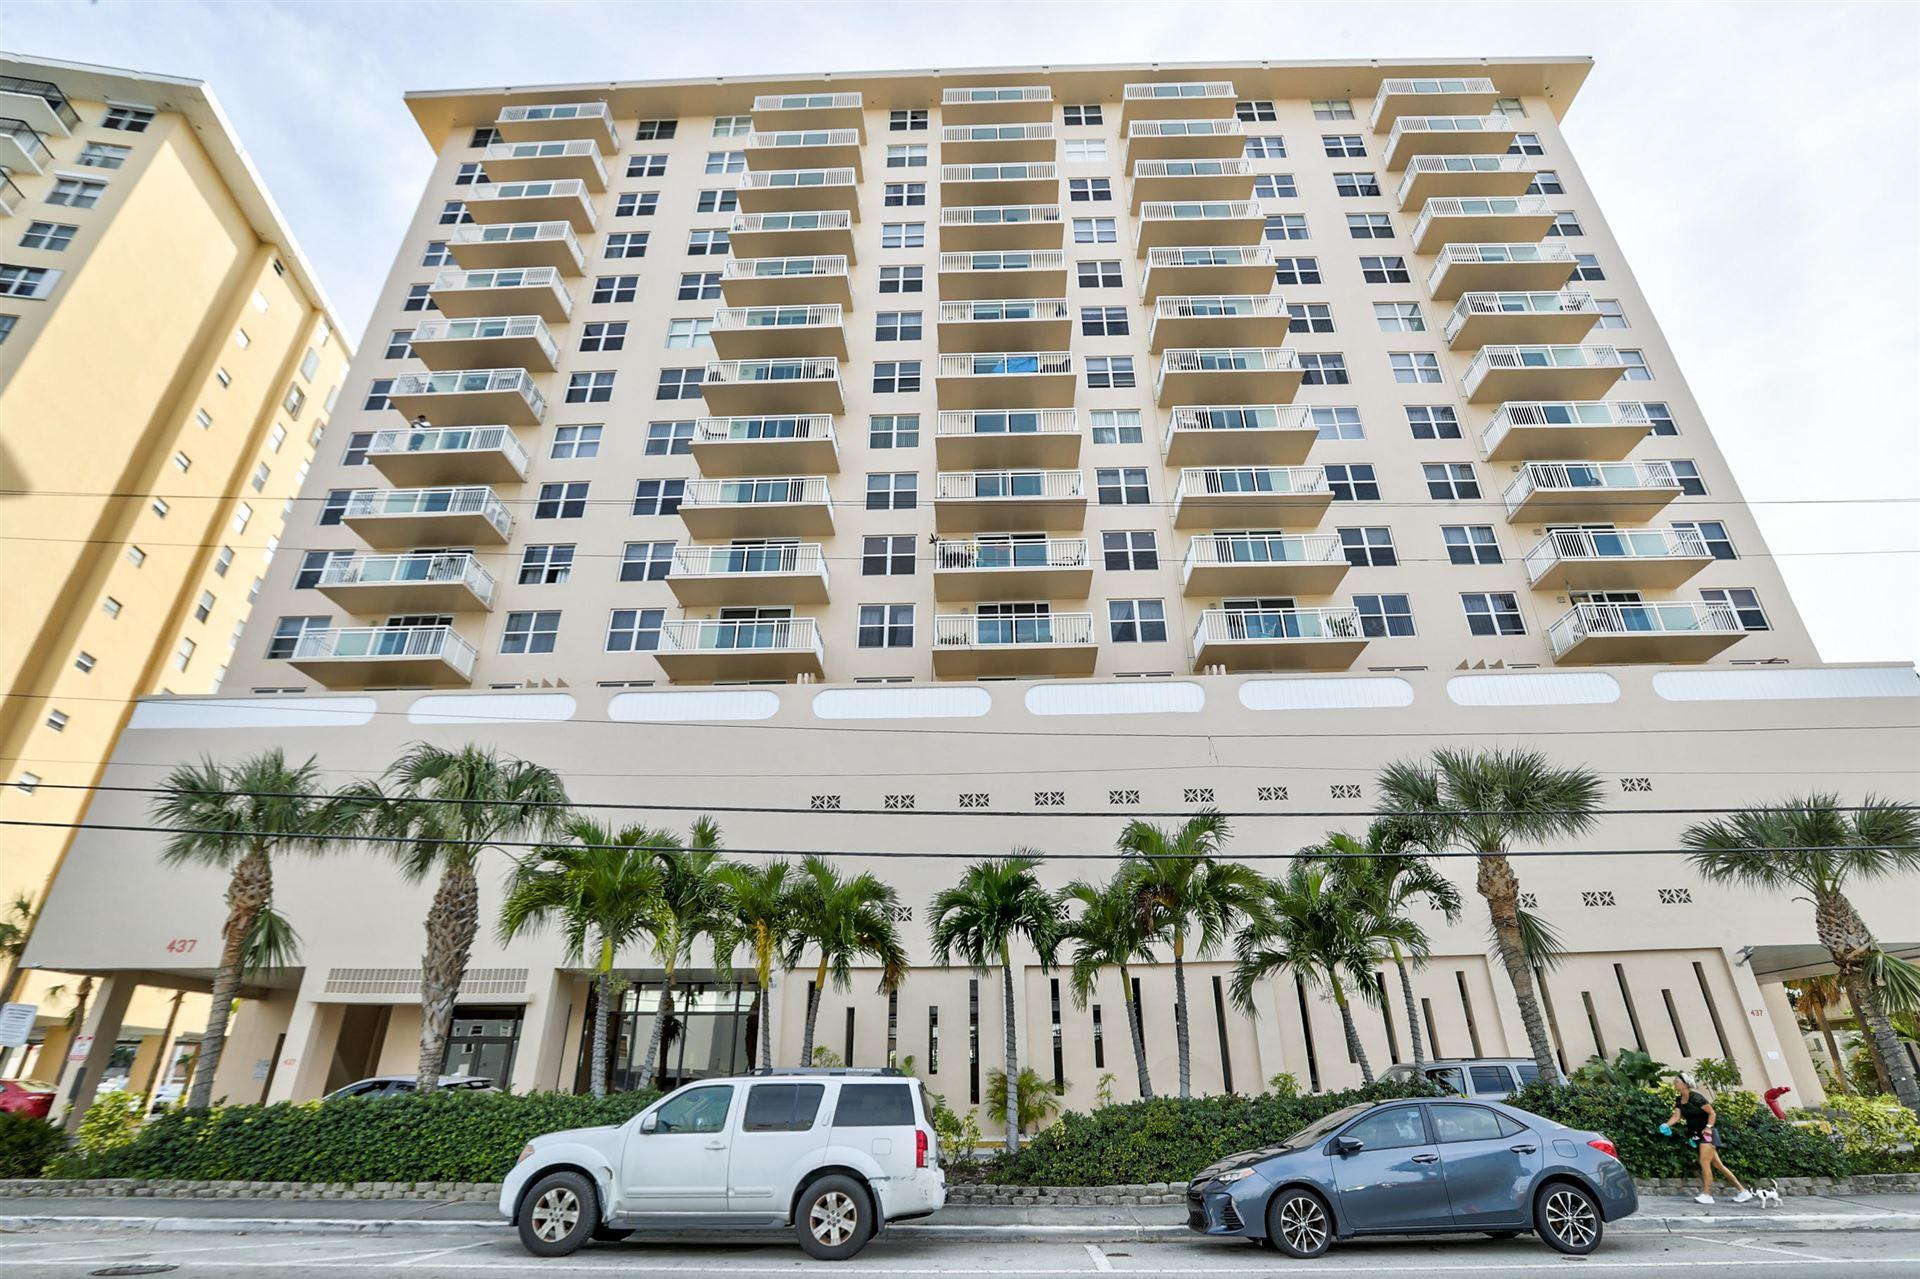 437 Golden Isles Drive #4c, Hallandale Beach, FL 33009 - MLS#: RX-10621333